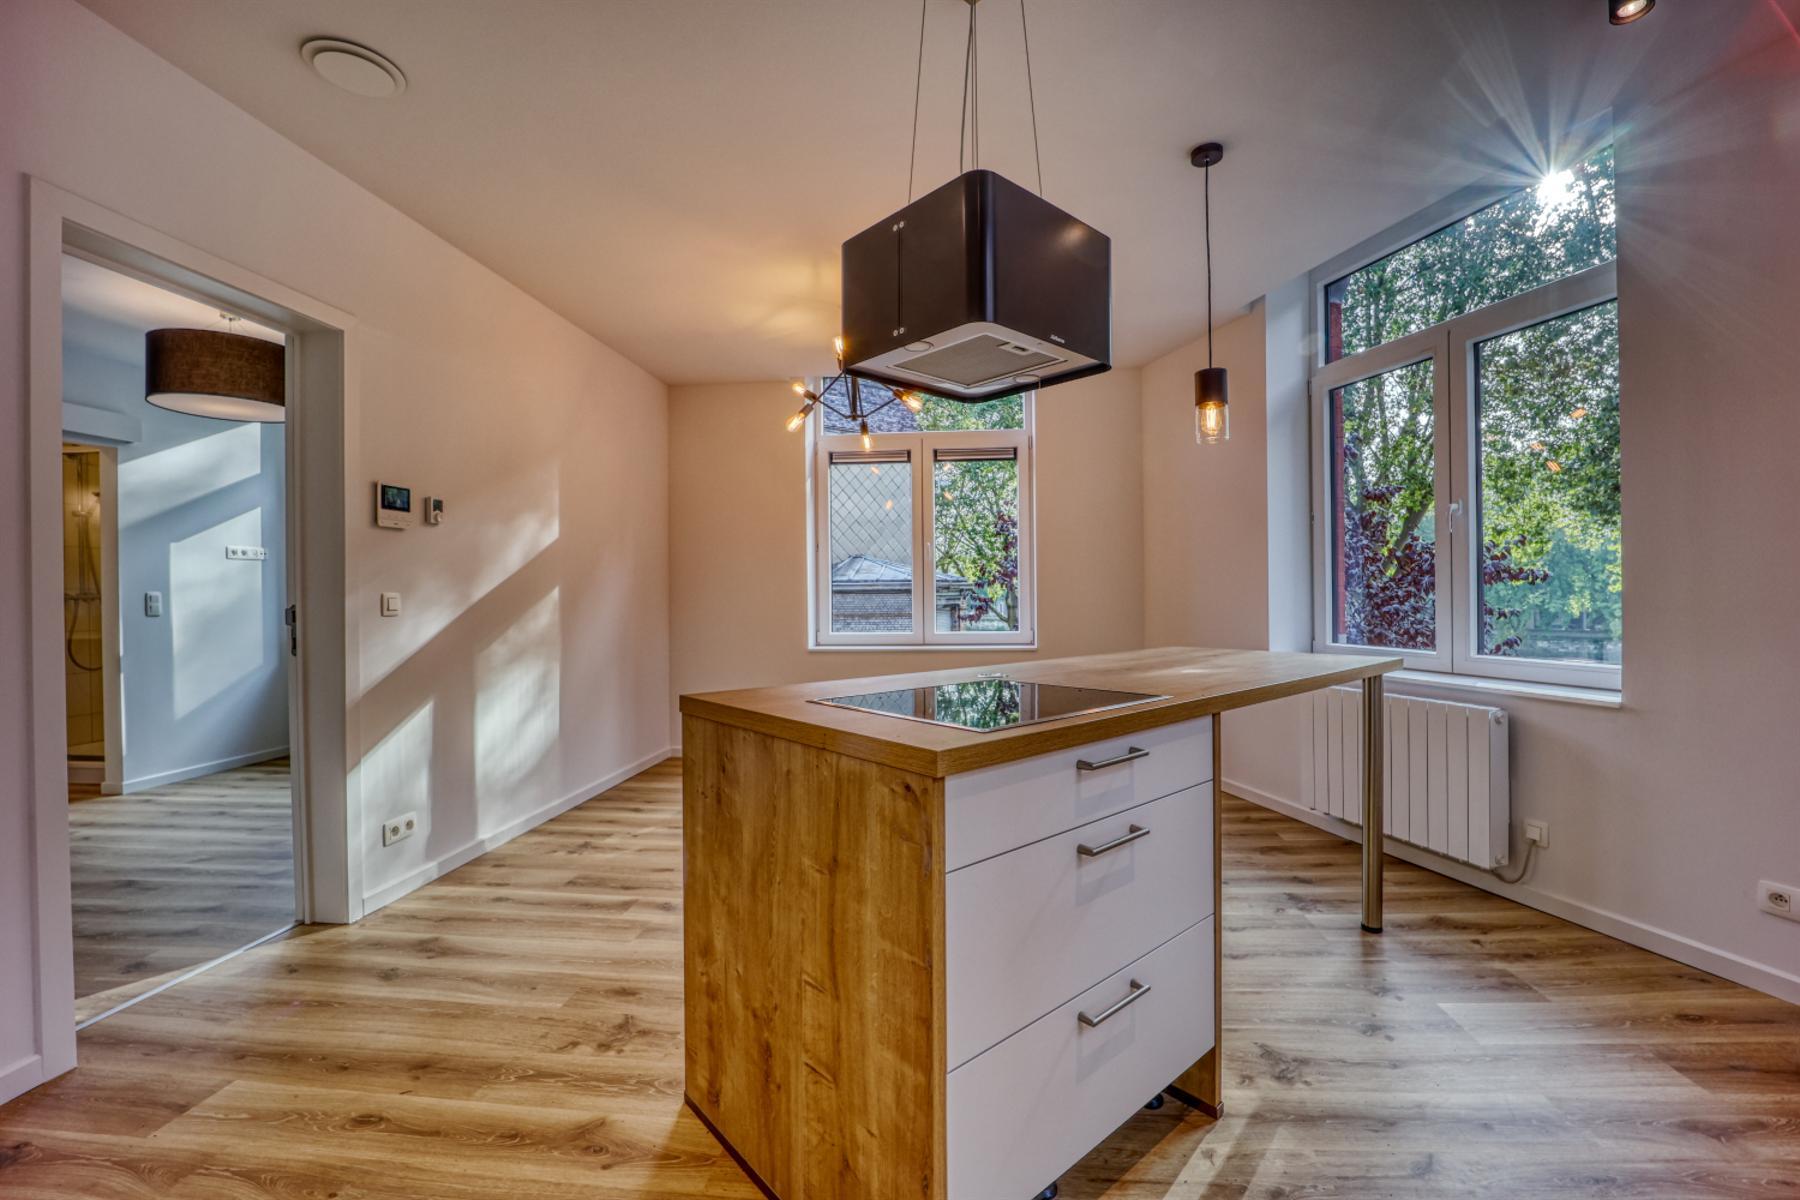 Appartement - Liège - #4512665-11